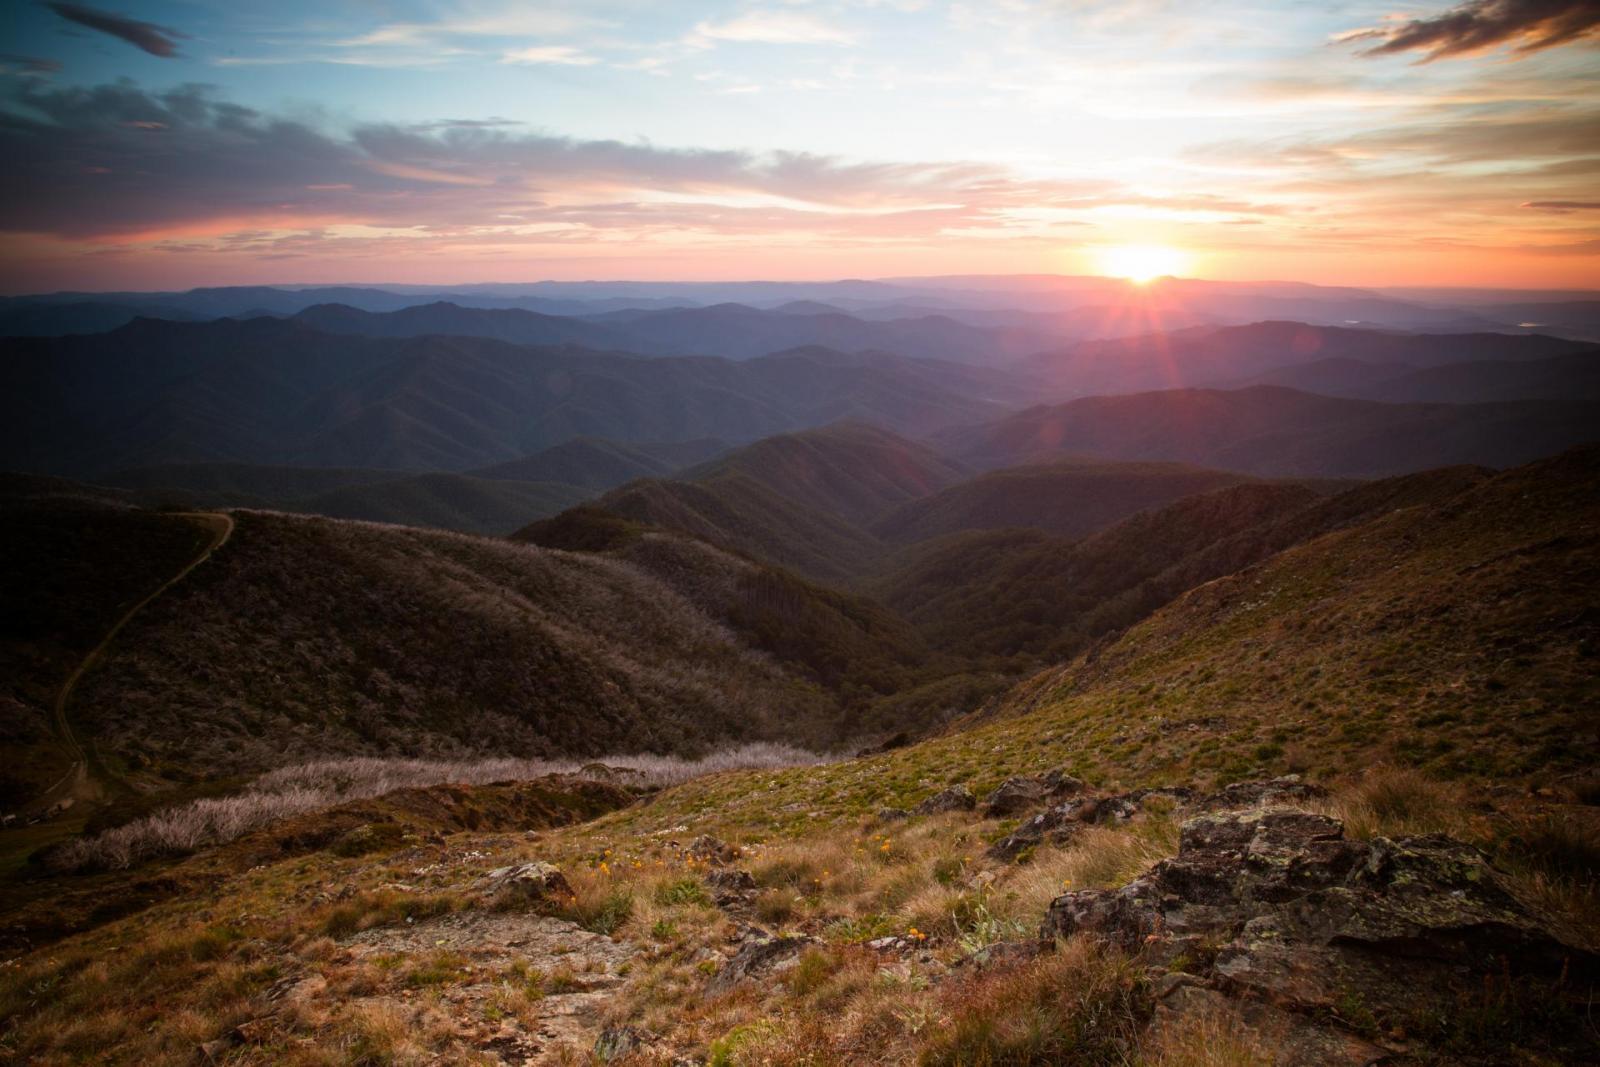 Berg Mount Buller Aussicht Mansfield interessante Orte Australien